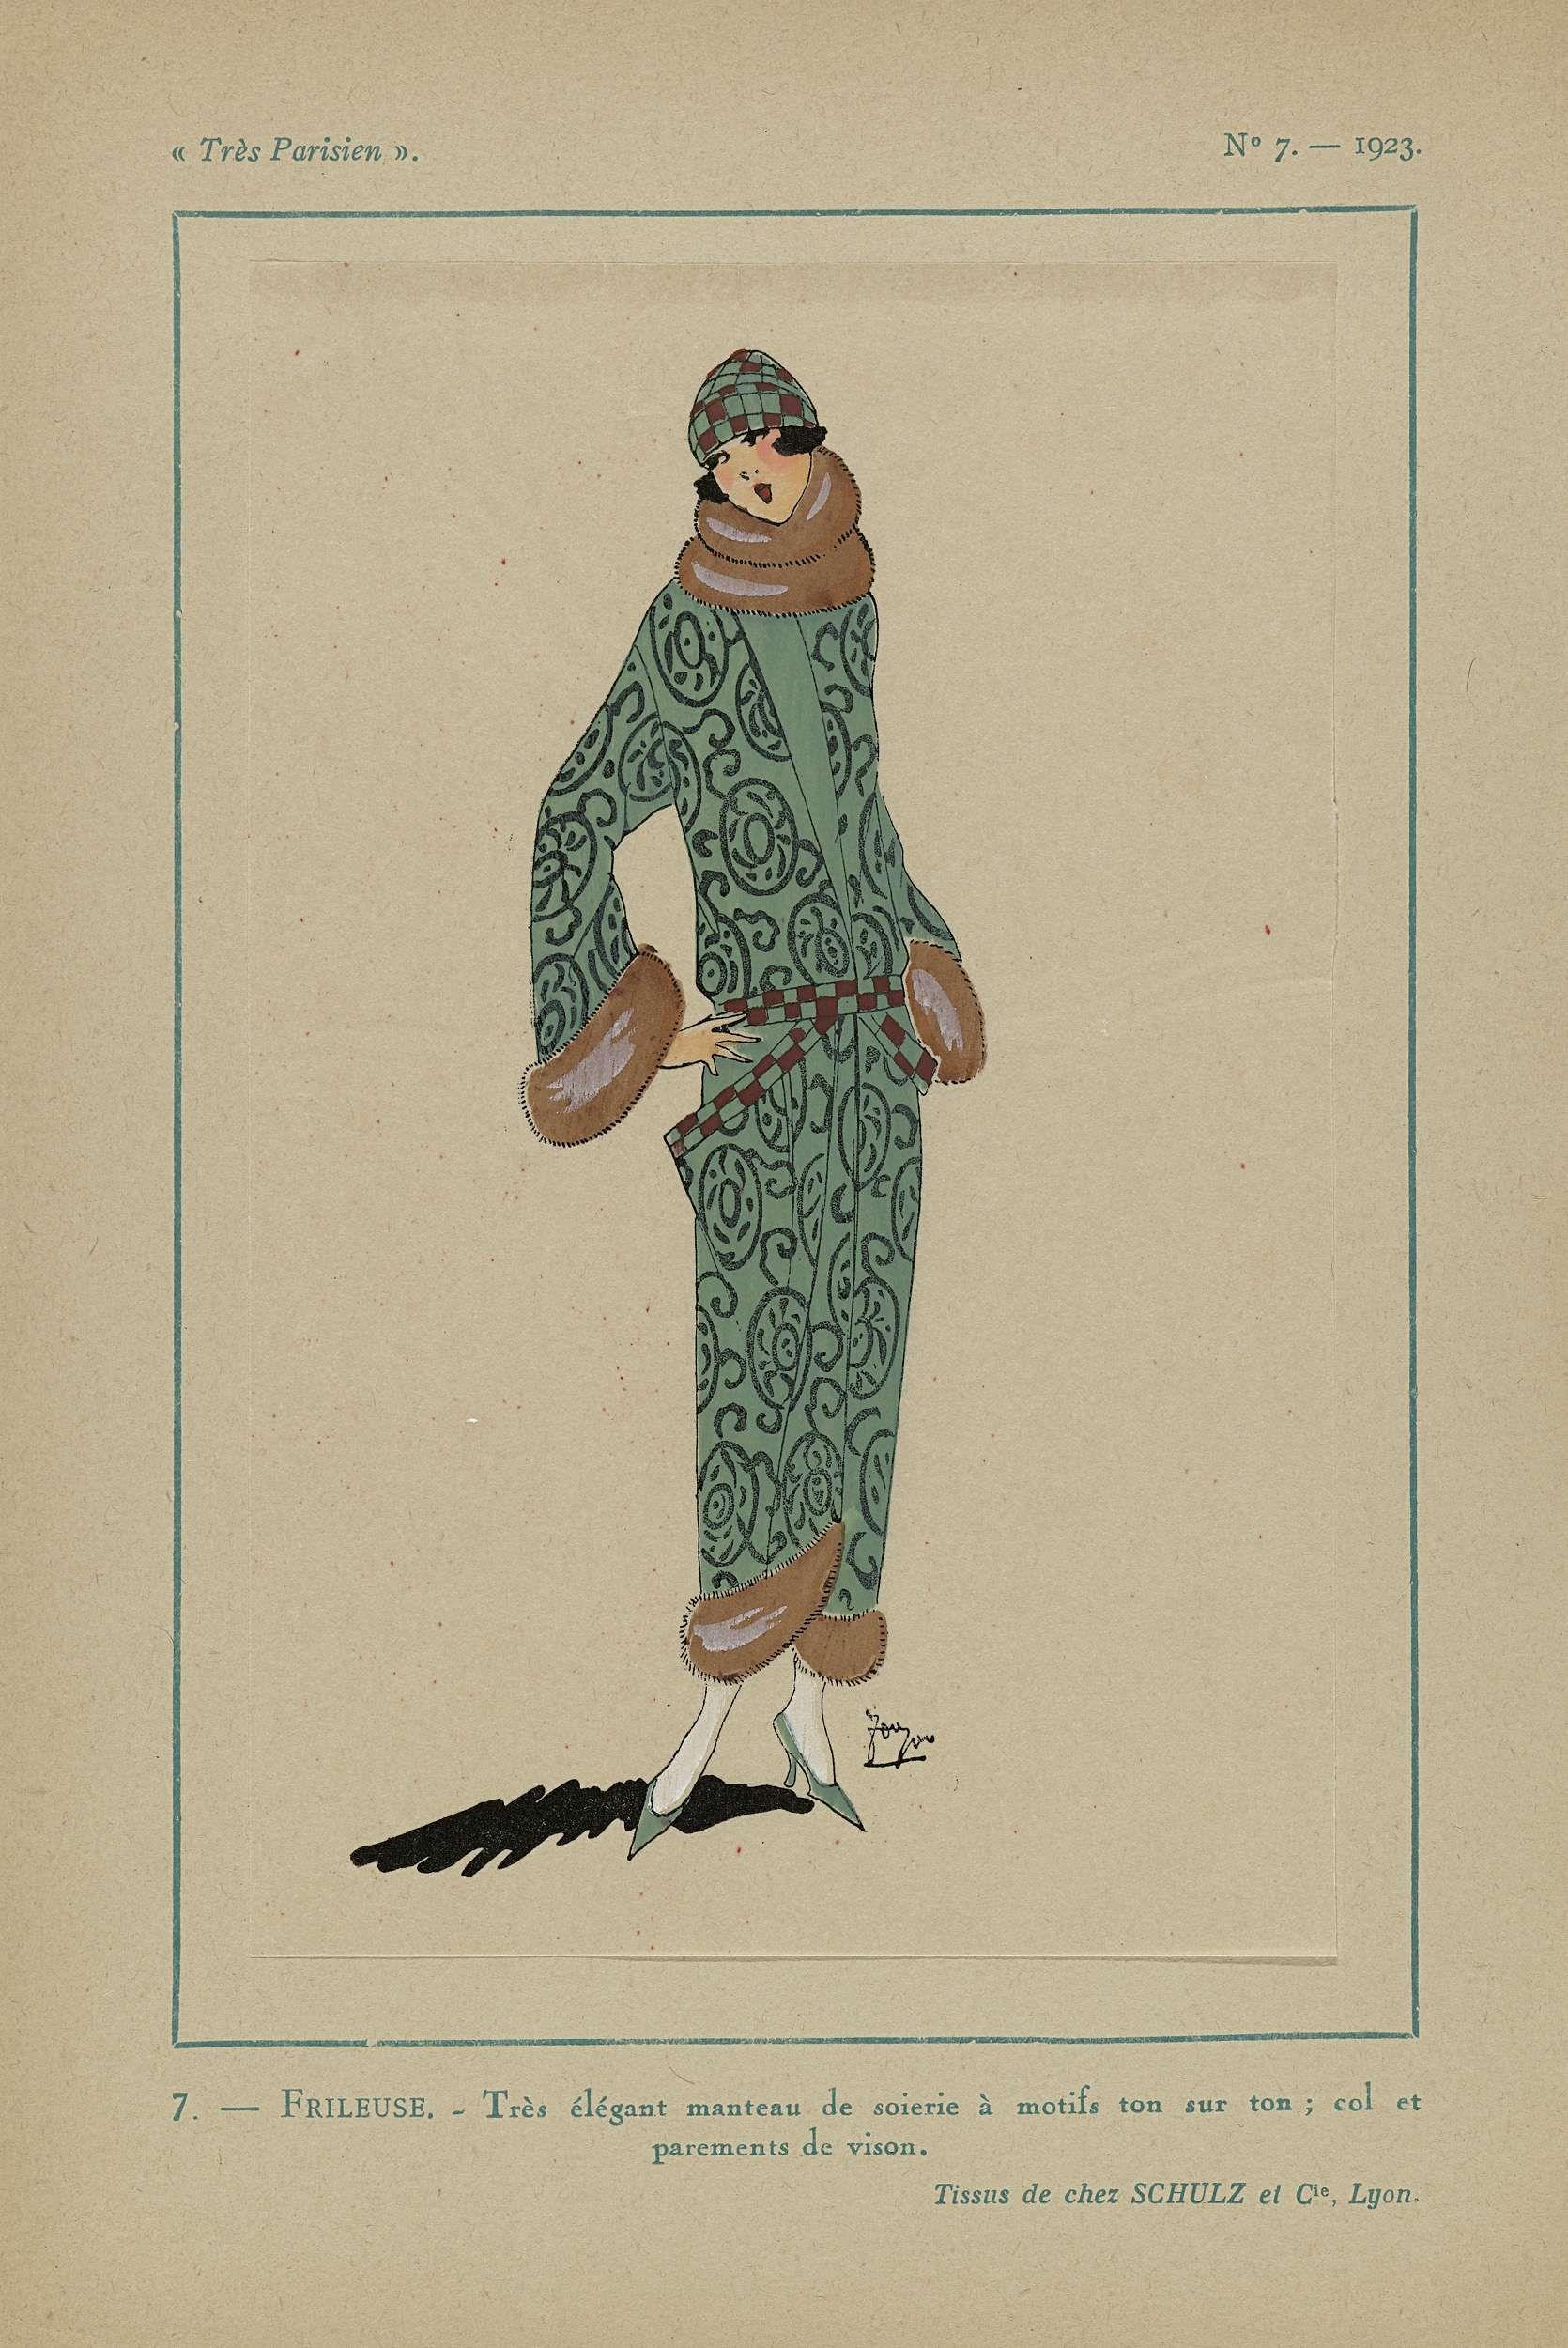 Anonymous   Très Parisien, 1923, No 7: 7. - FRILEUSE. - Très élégant manteau..., Anonymous, Schulz et Cie, G-P. Joumard, 1923   Mantel van zijde met motieven in dezelfde tinten; kraag en manchetten van nerts (bont).  Stoffen van Schulz et Cie. Prent uit het modetijdschrift Très Parisien (1920-1936).